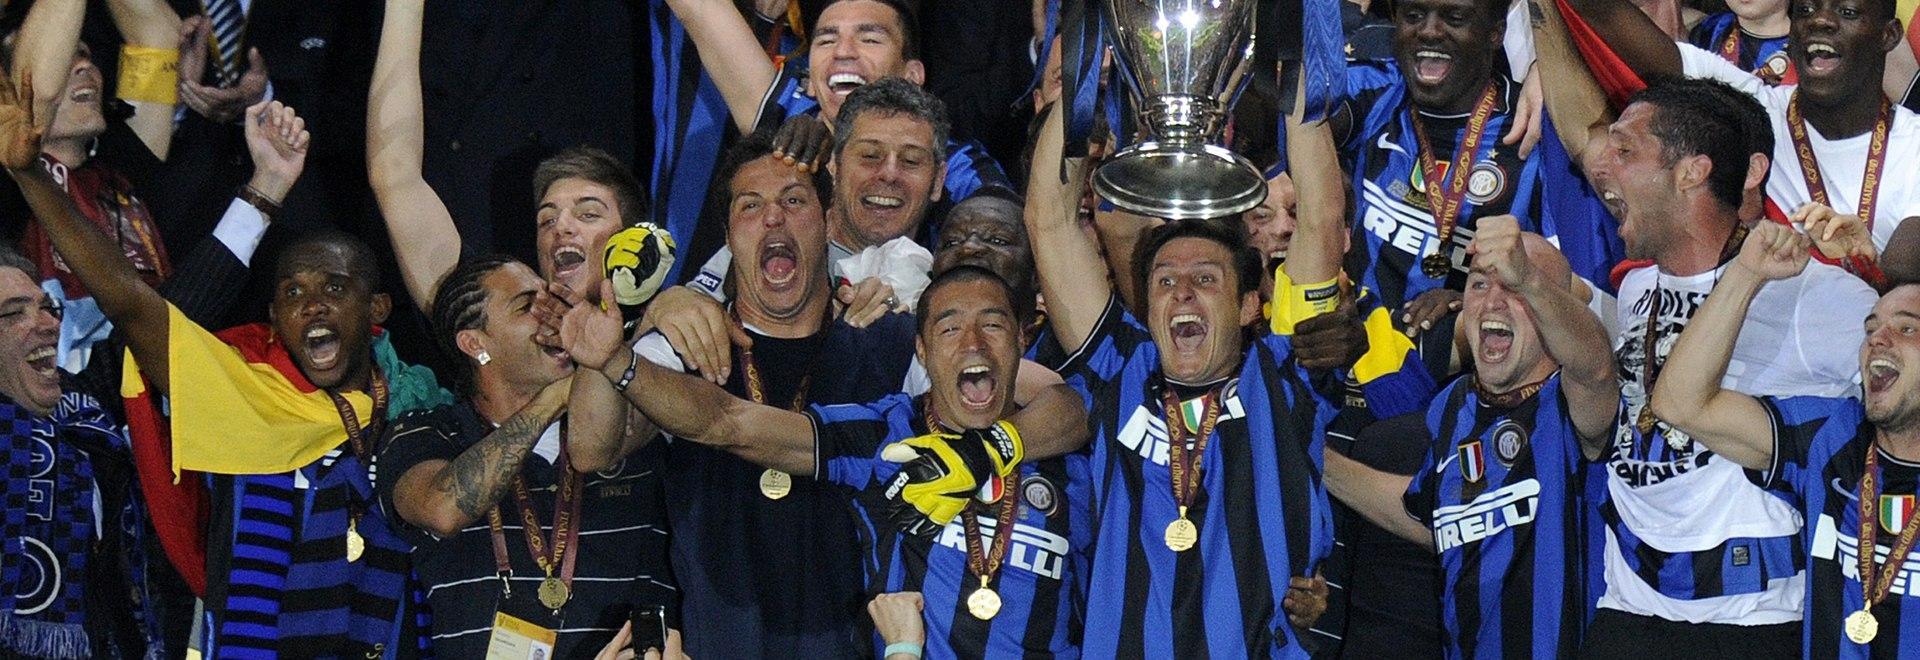 Road to Madrid Inter sul tetto d'Europa